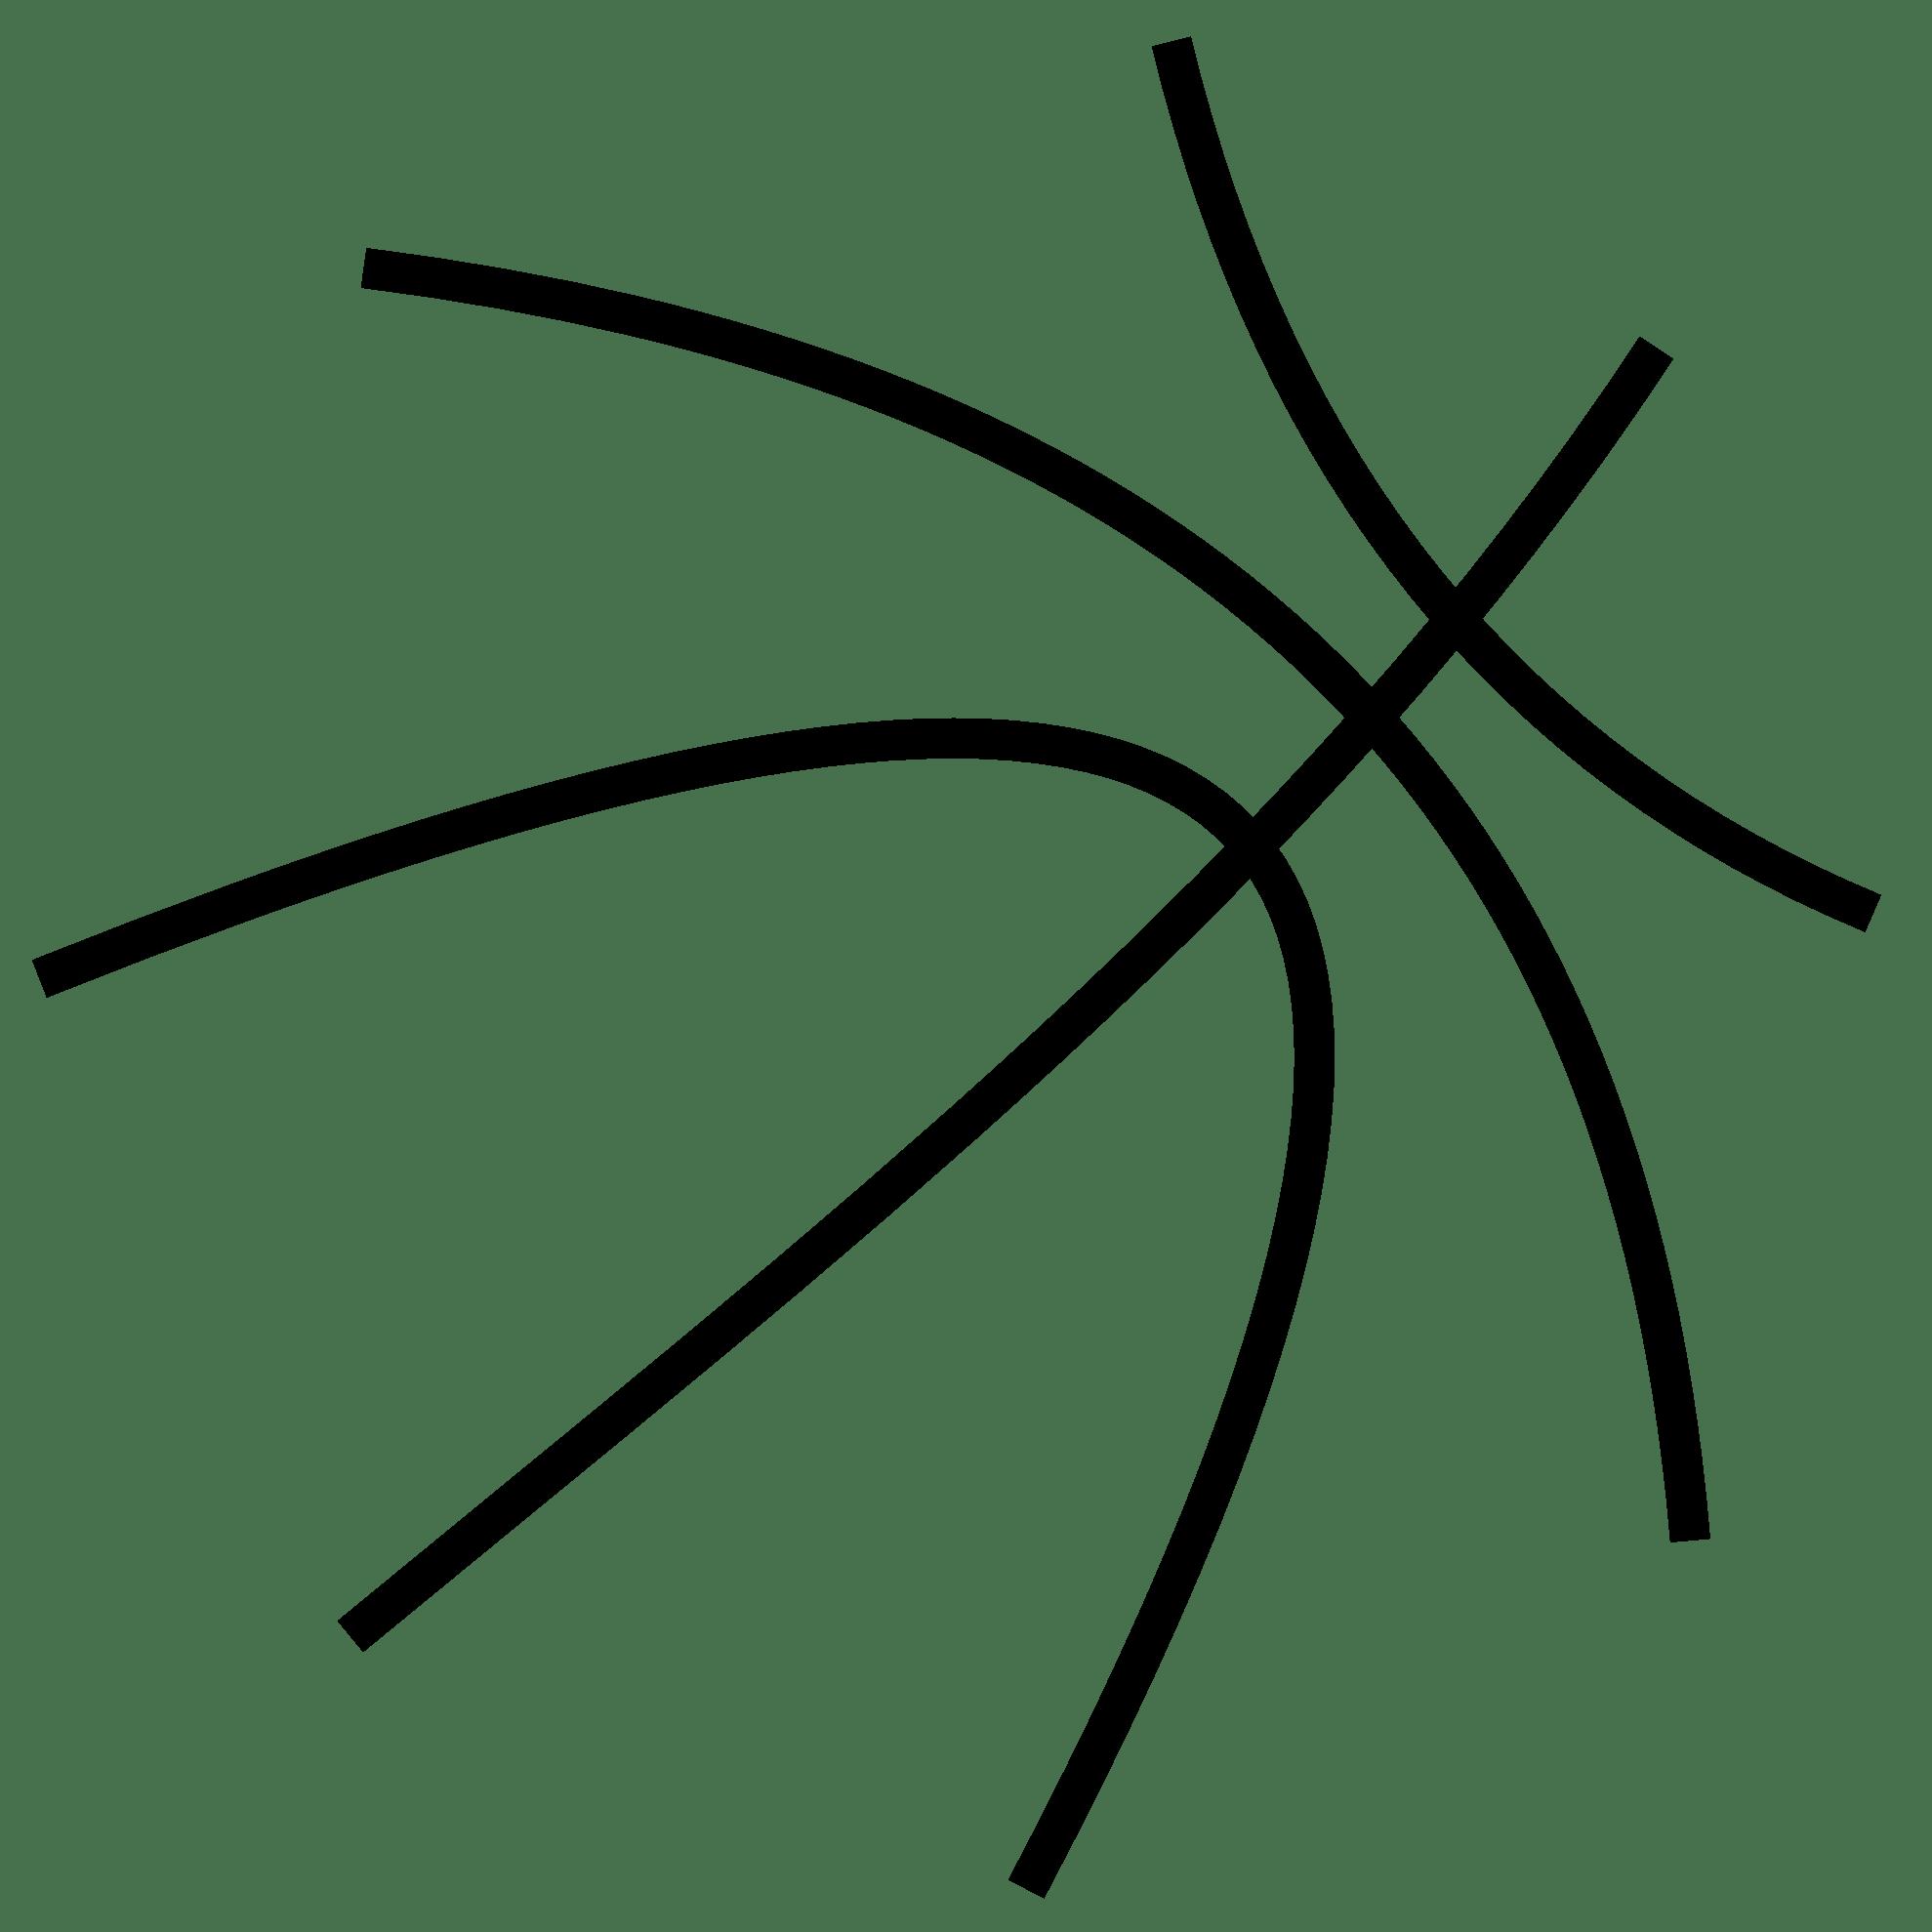 Girls Basketball Clipart Black And White Clipart Panda